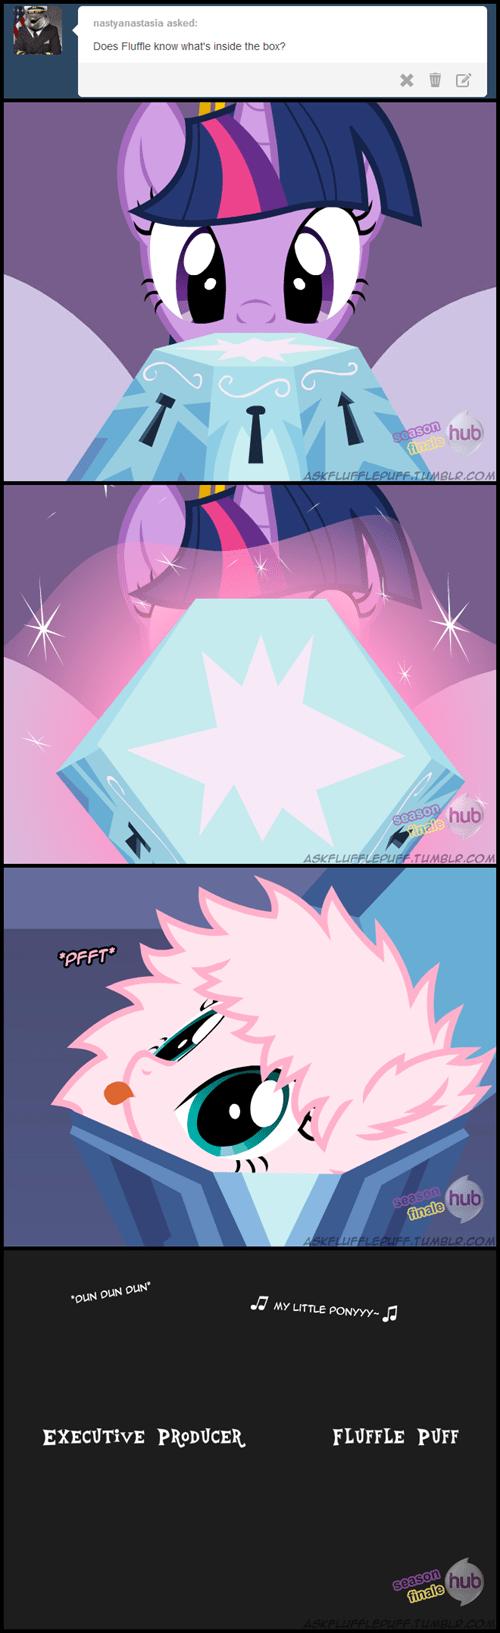 twilight sparkle spoilers the box flufflepuff - 7937953792